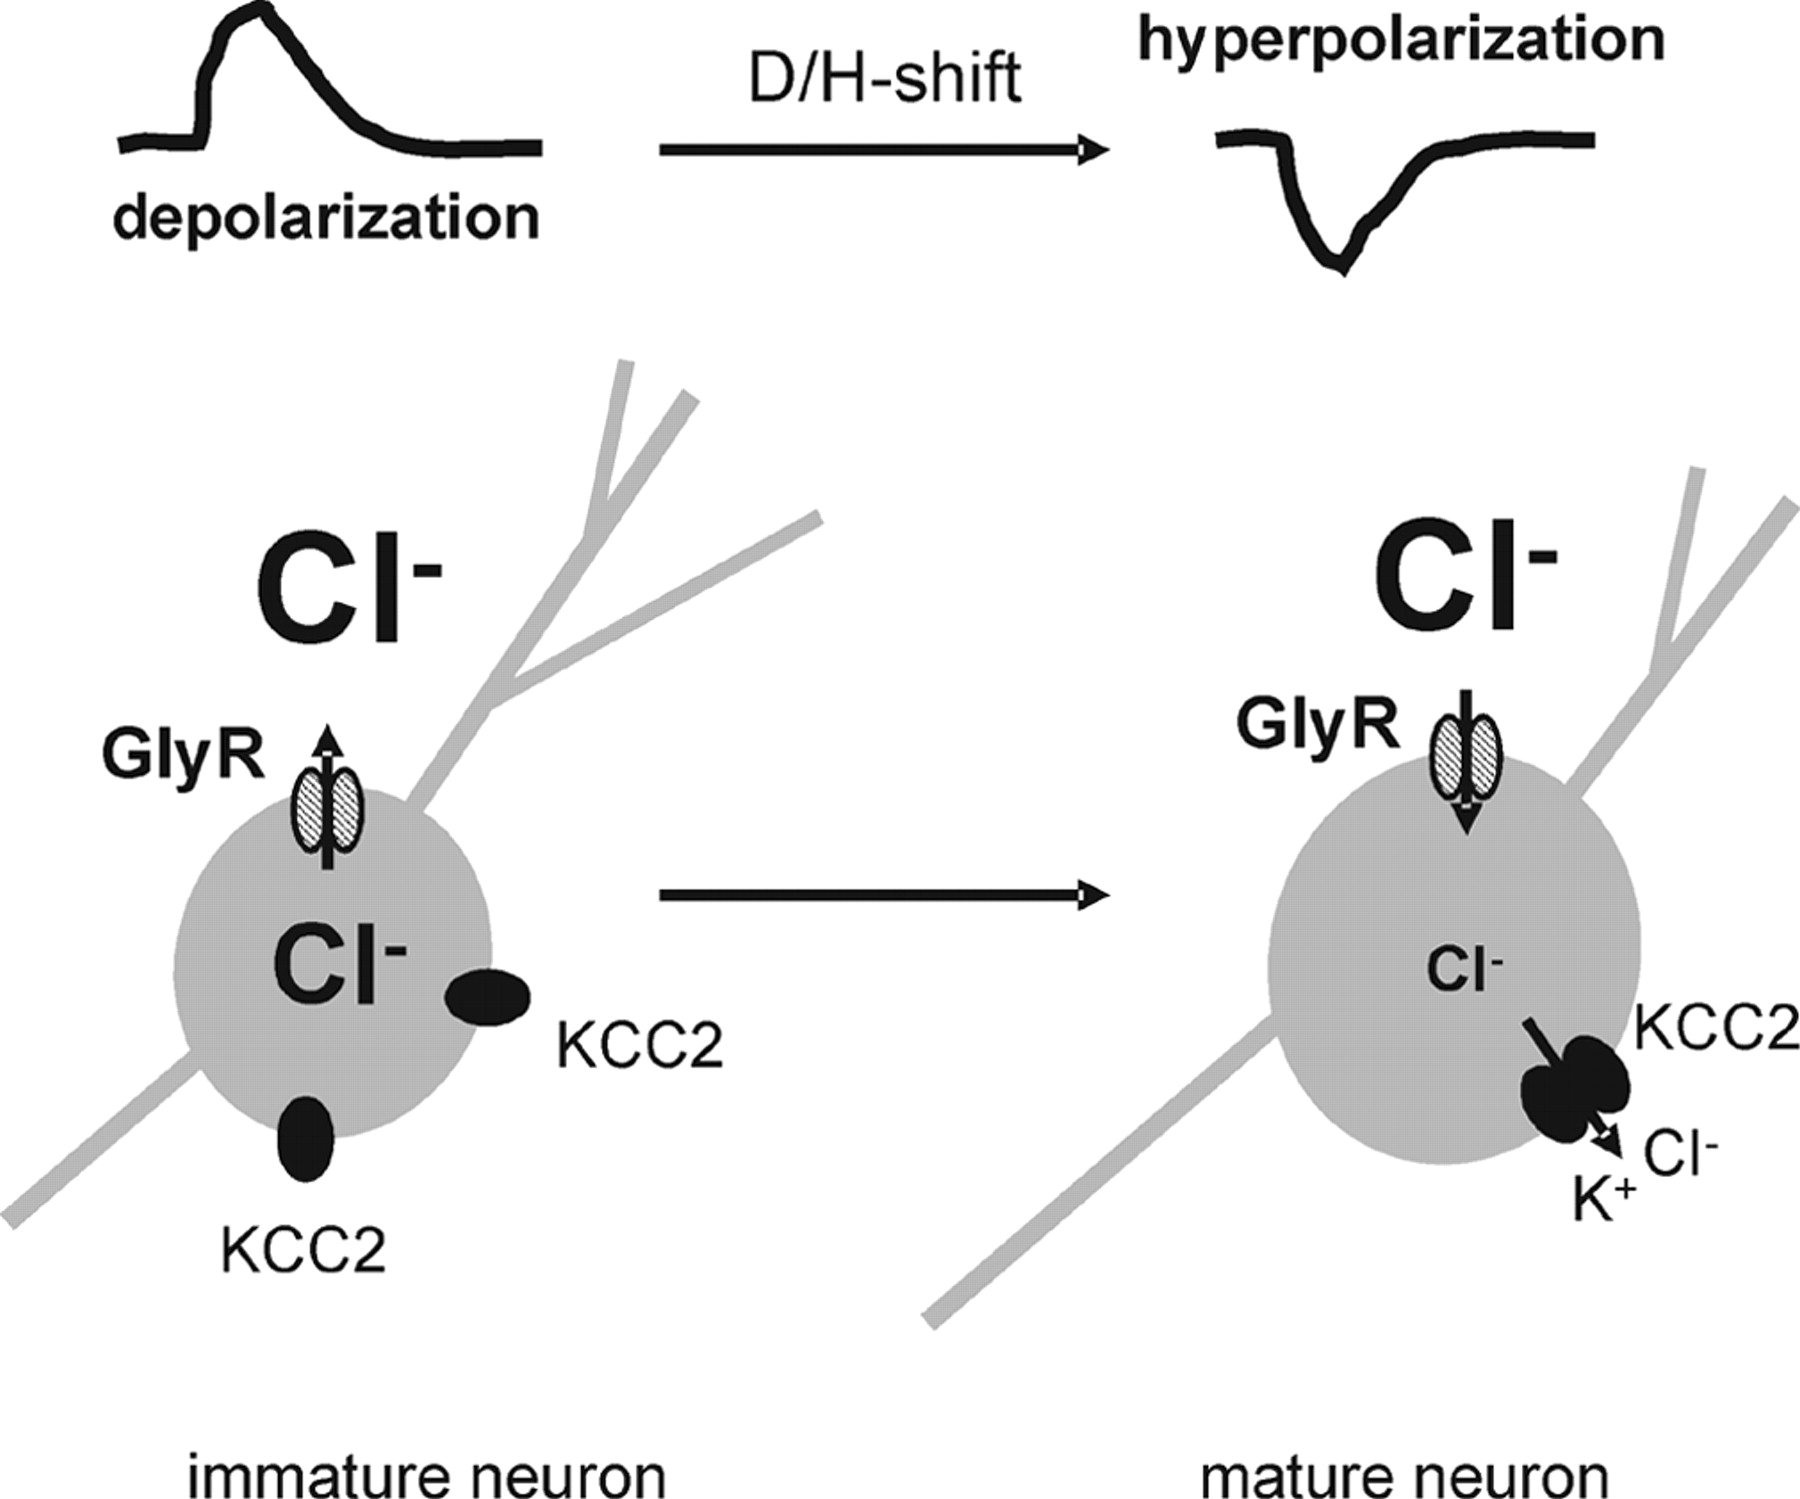 Oligomerization of KCC2 Correlates with Development of